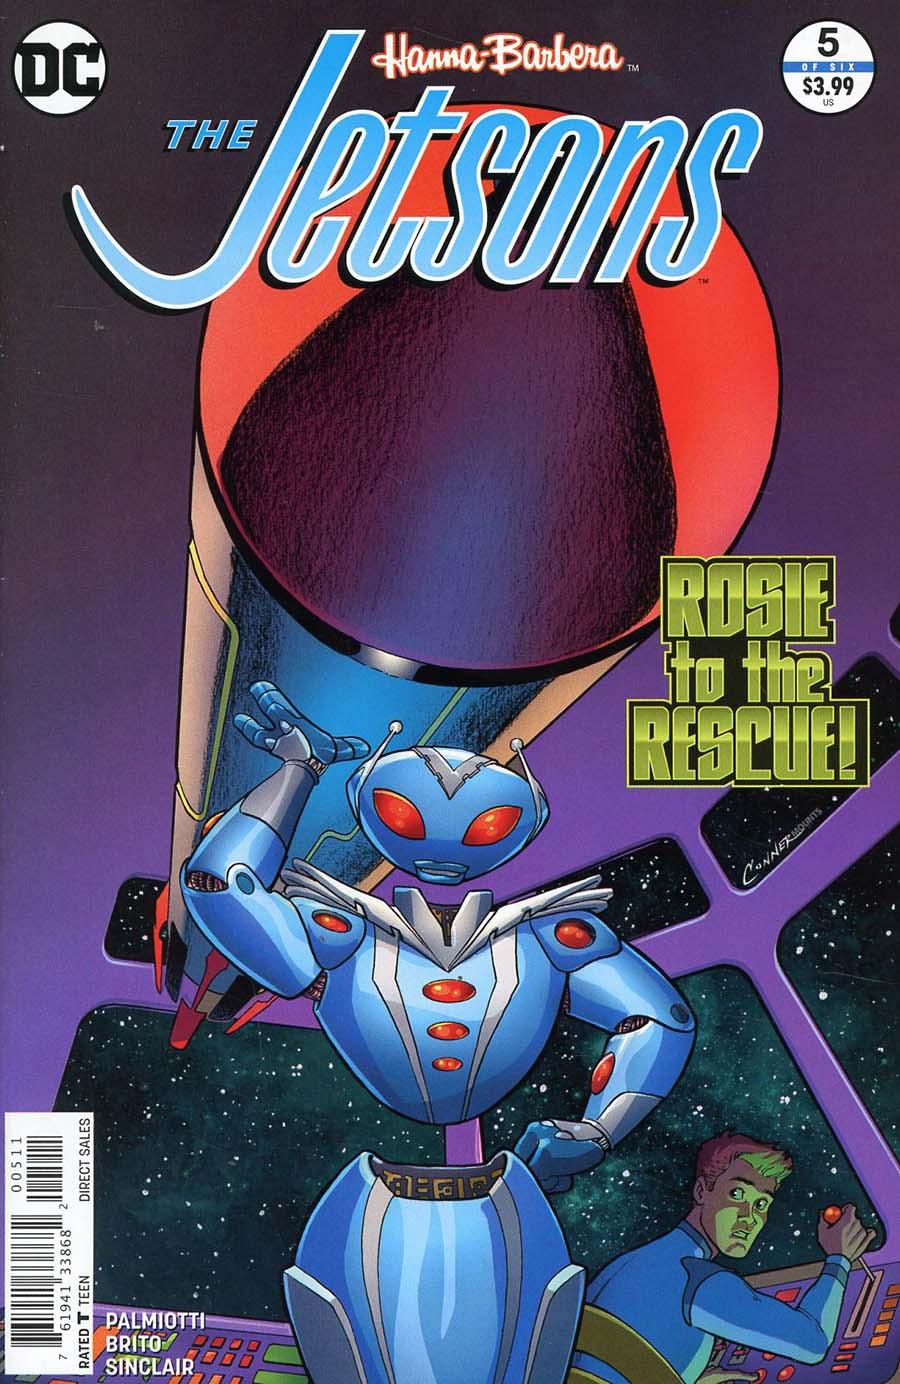 Jetsons (DC) #5 Cover A Regular Amanda Conner Cover